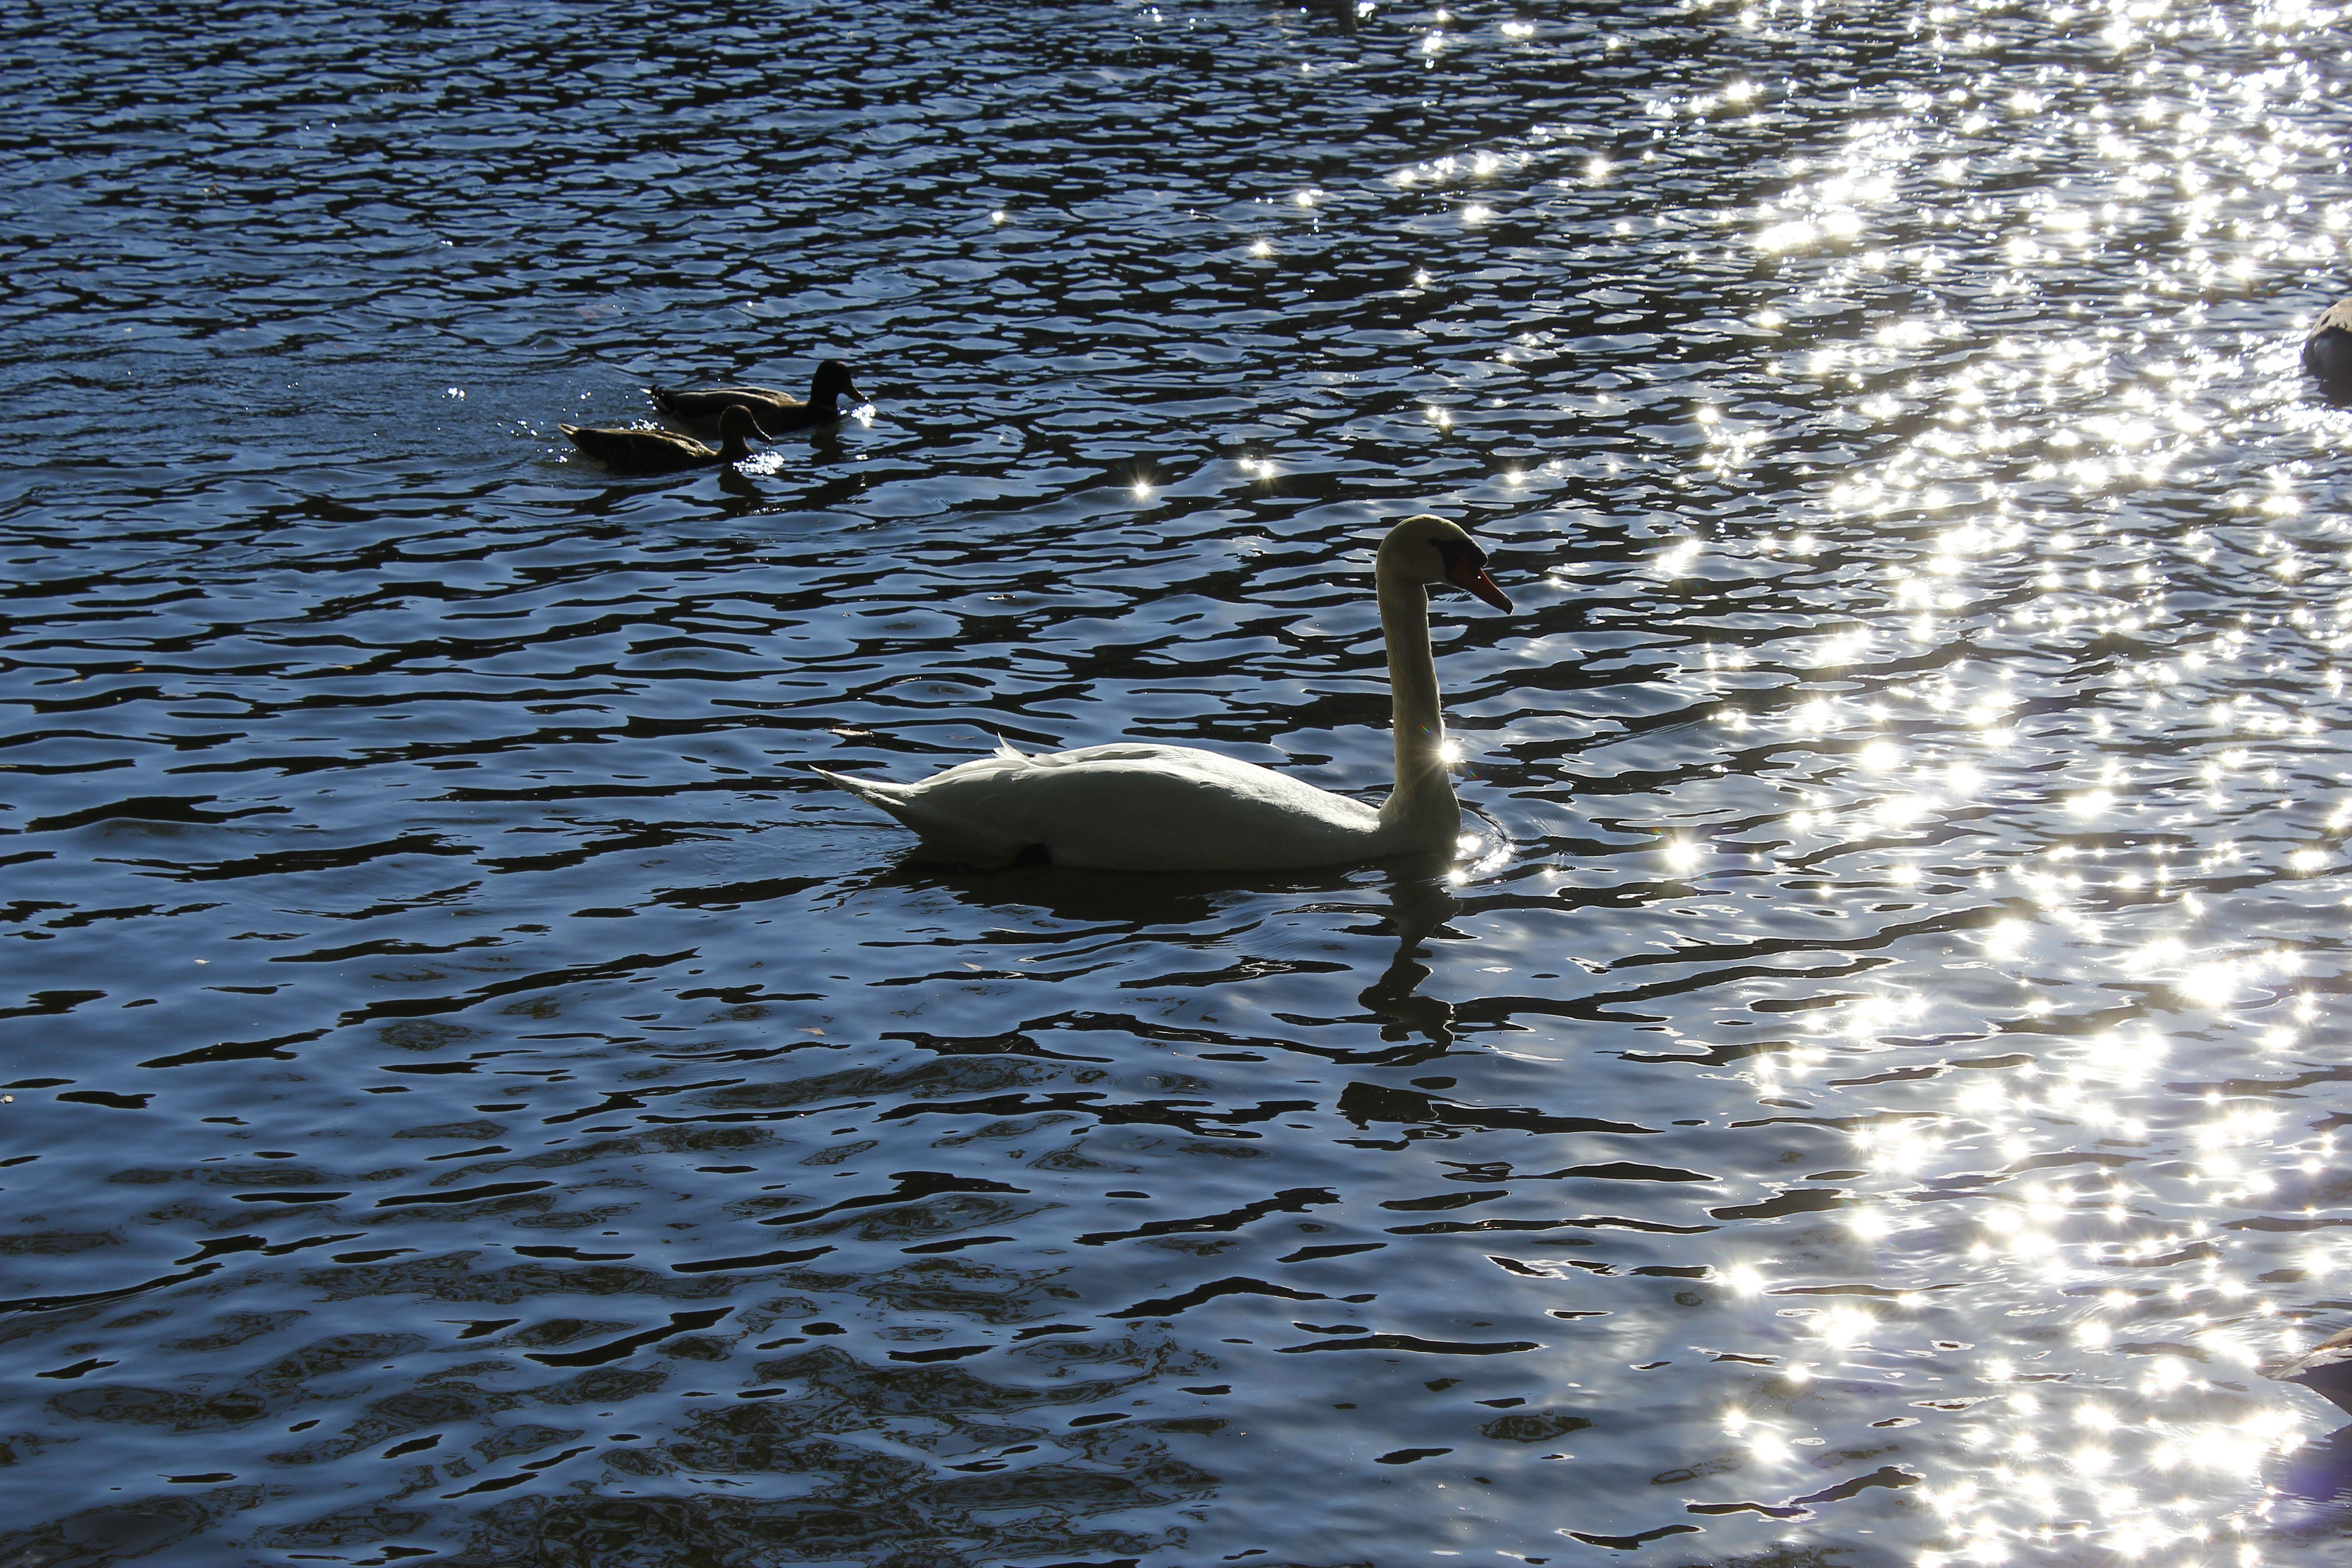 Swan in StonyBrook